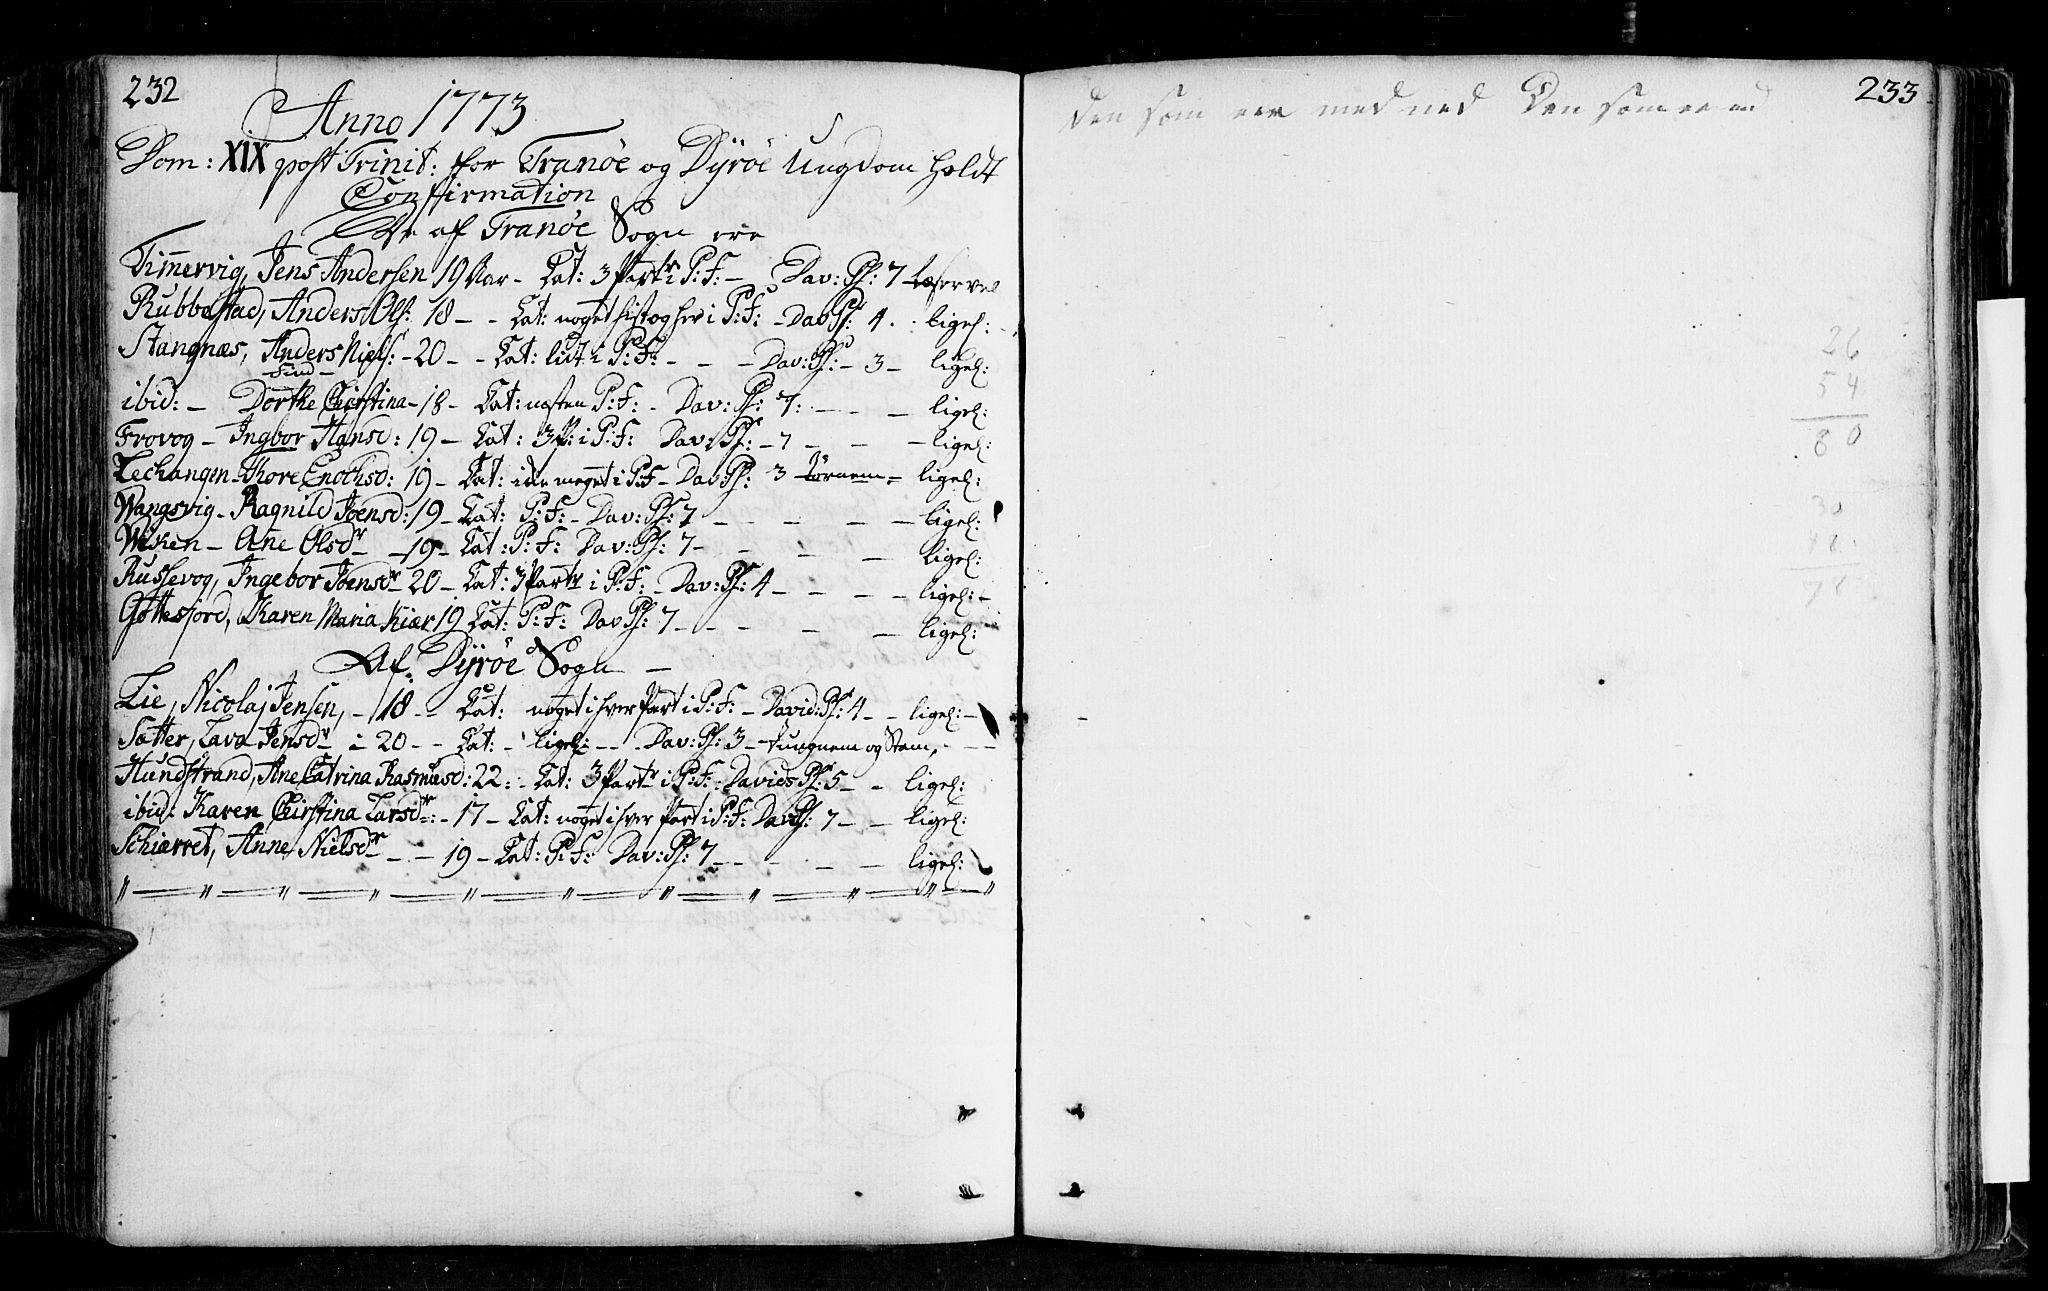 SATØ, Tranøy sokneprestkontor, I/Ia/Iaa/L0001kirke: Ministerialbok nr. 1, 1757-1773, s. 232-233